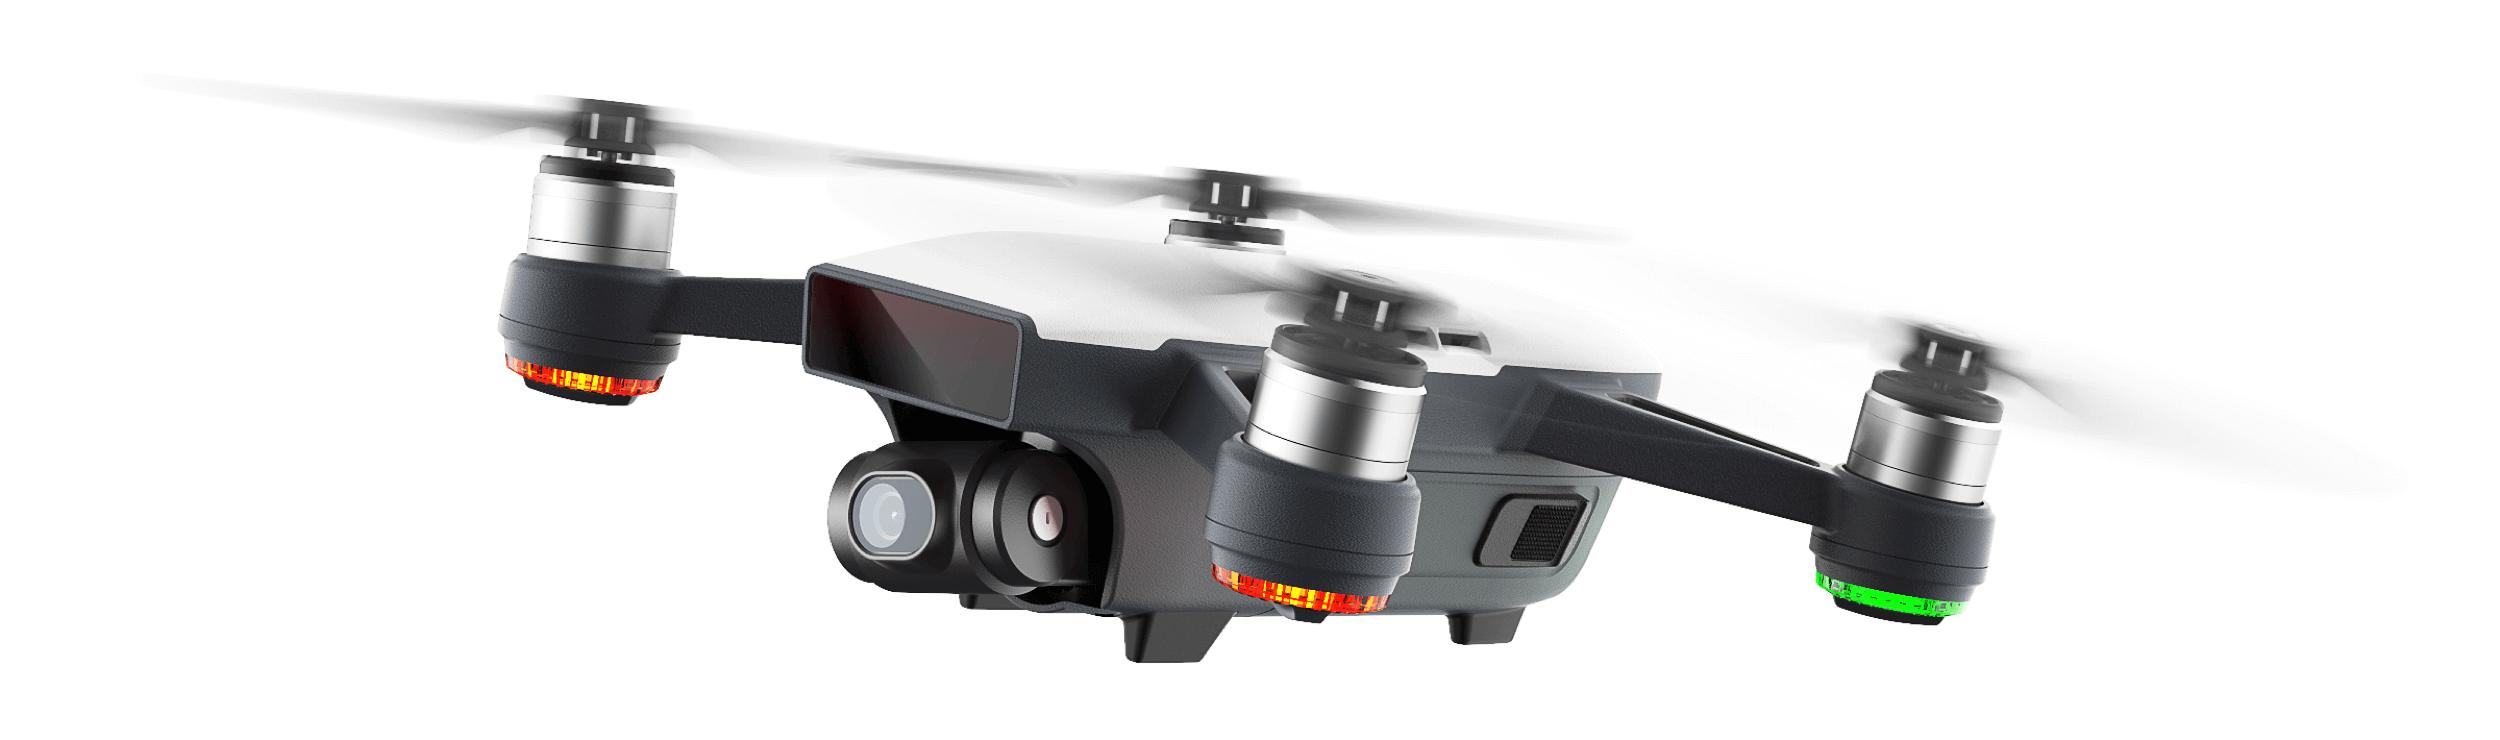 detail1-ac31681ce5417ef8495c58b99d7687ae Coupon per DJI Spark e Xiaomi Mi Drone